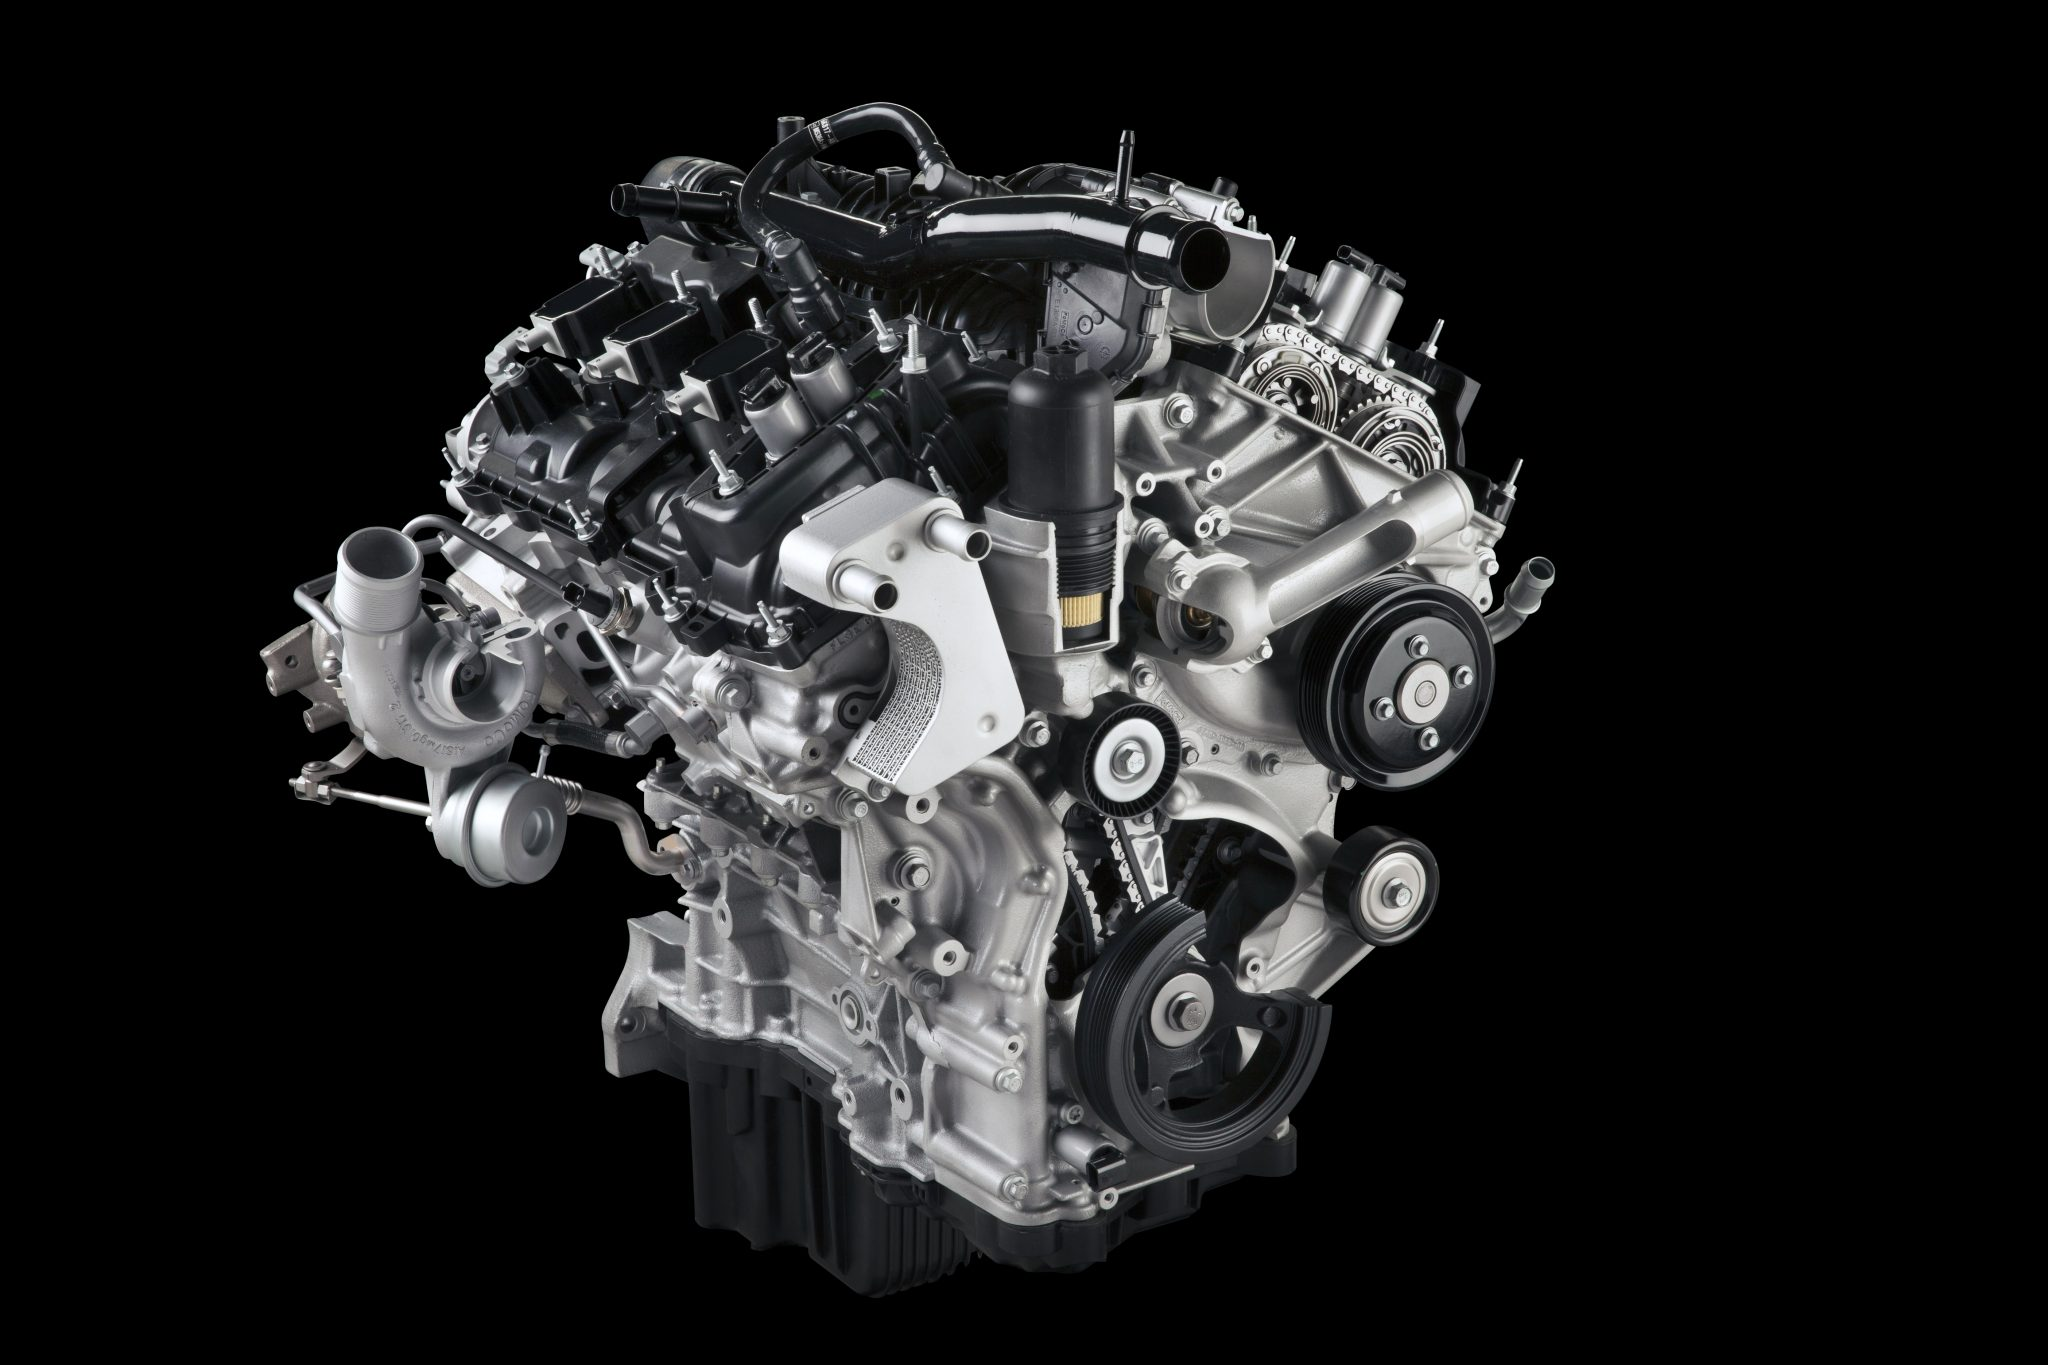 2015 f 150 2 7 liter ecoboost 3 5 liter engine specs revealed the